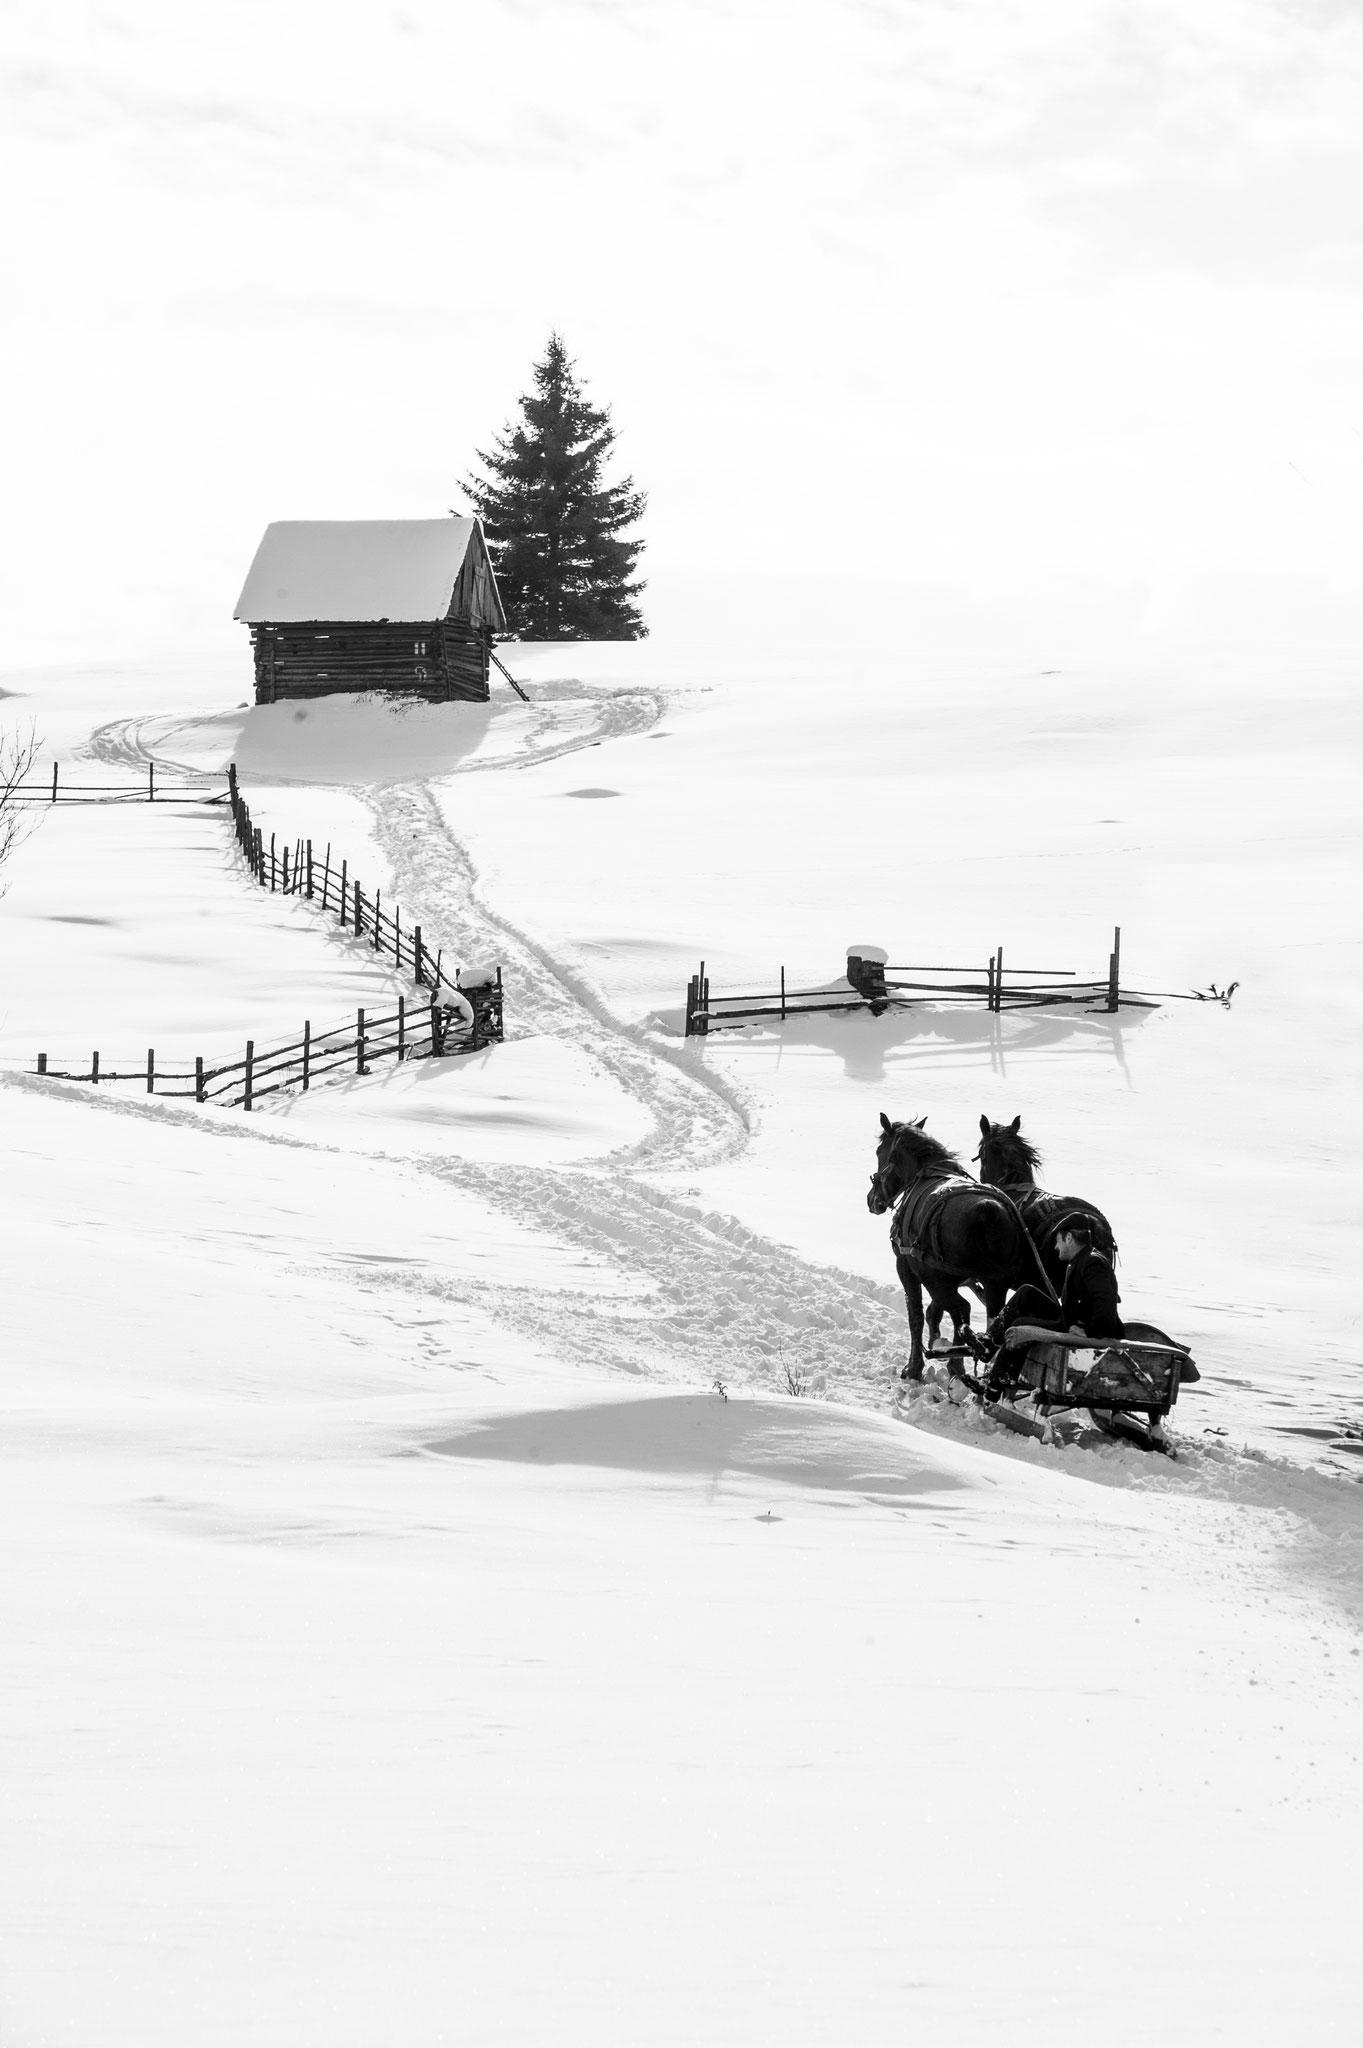 Tordai Ede EFIAPs (Romania) - Winter in Gyimes